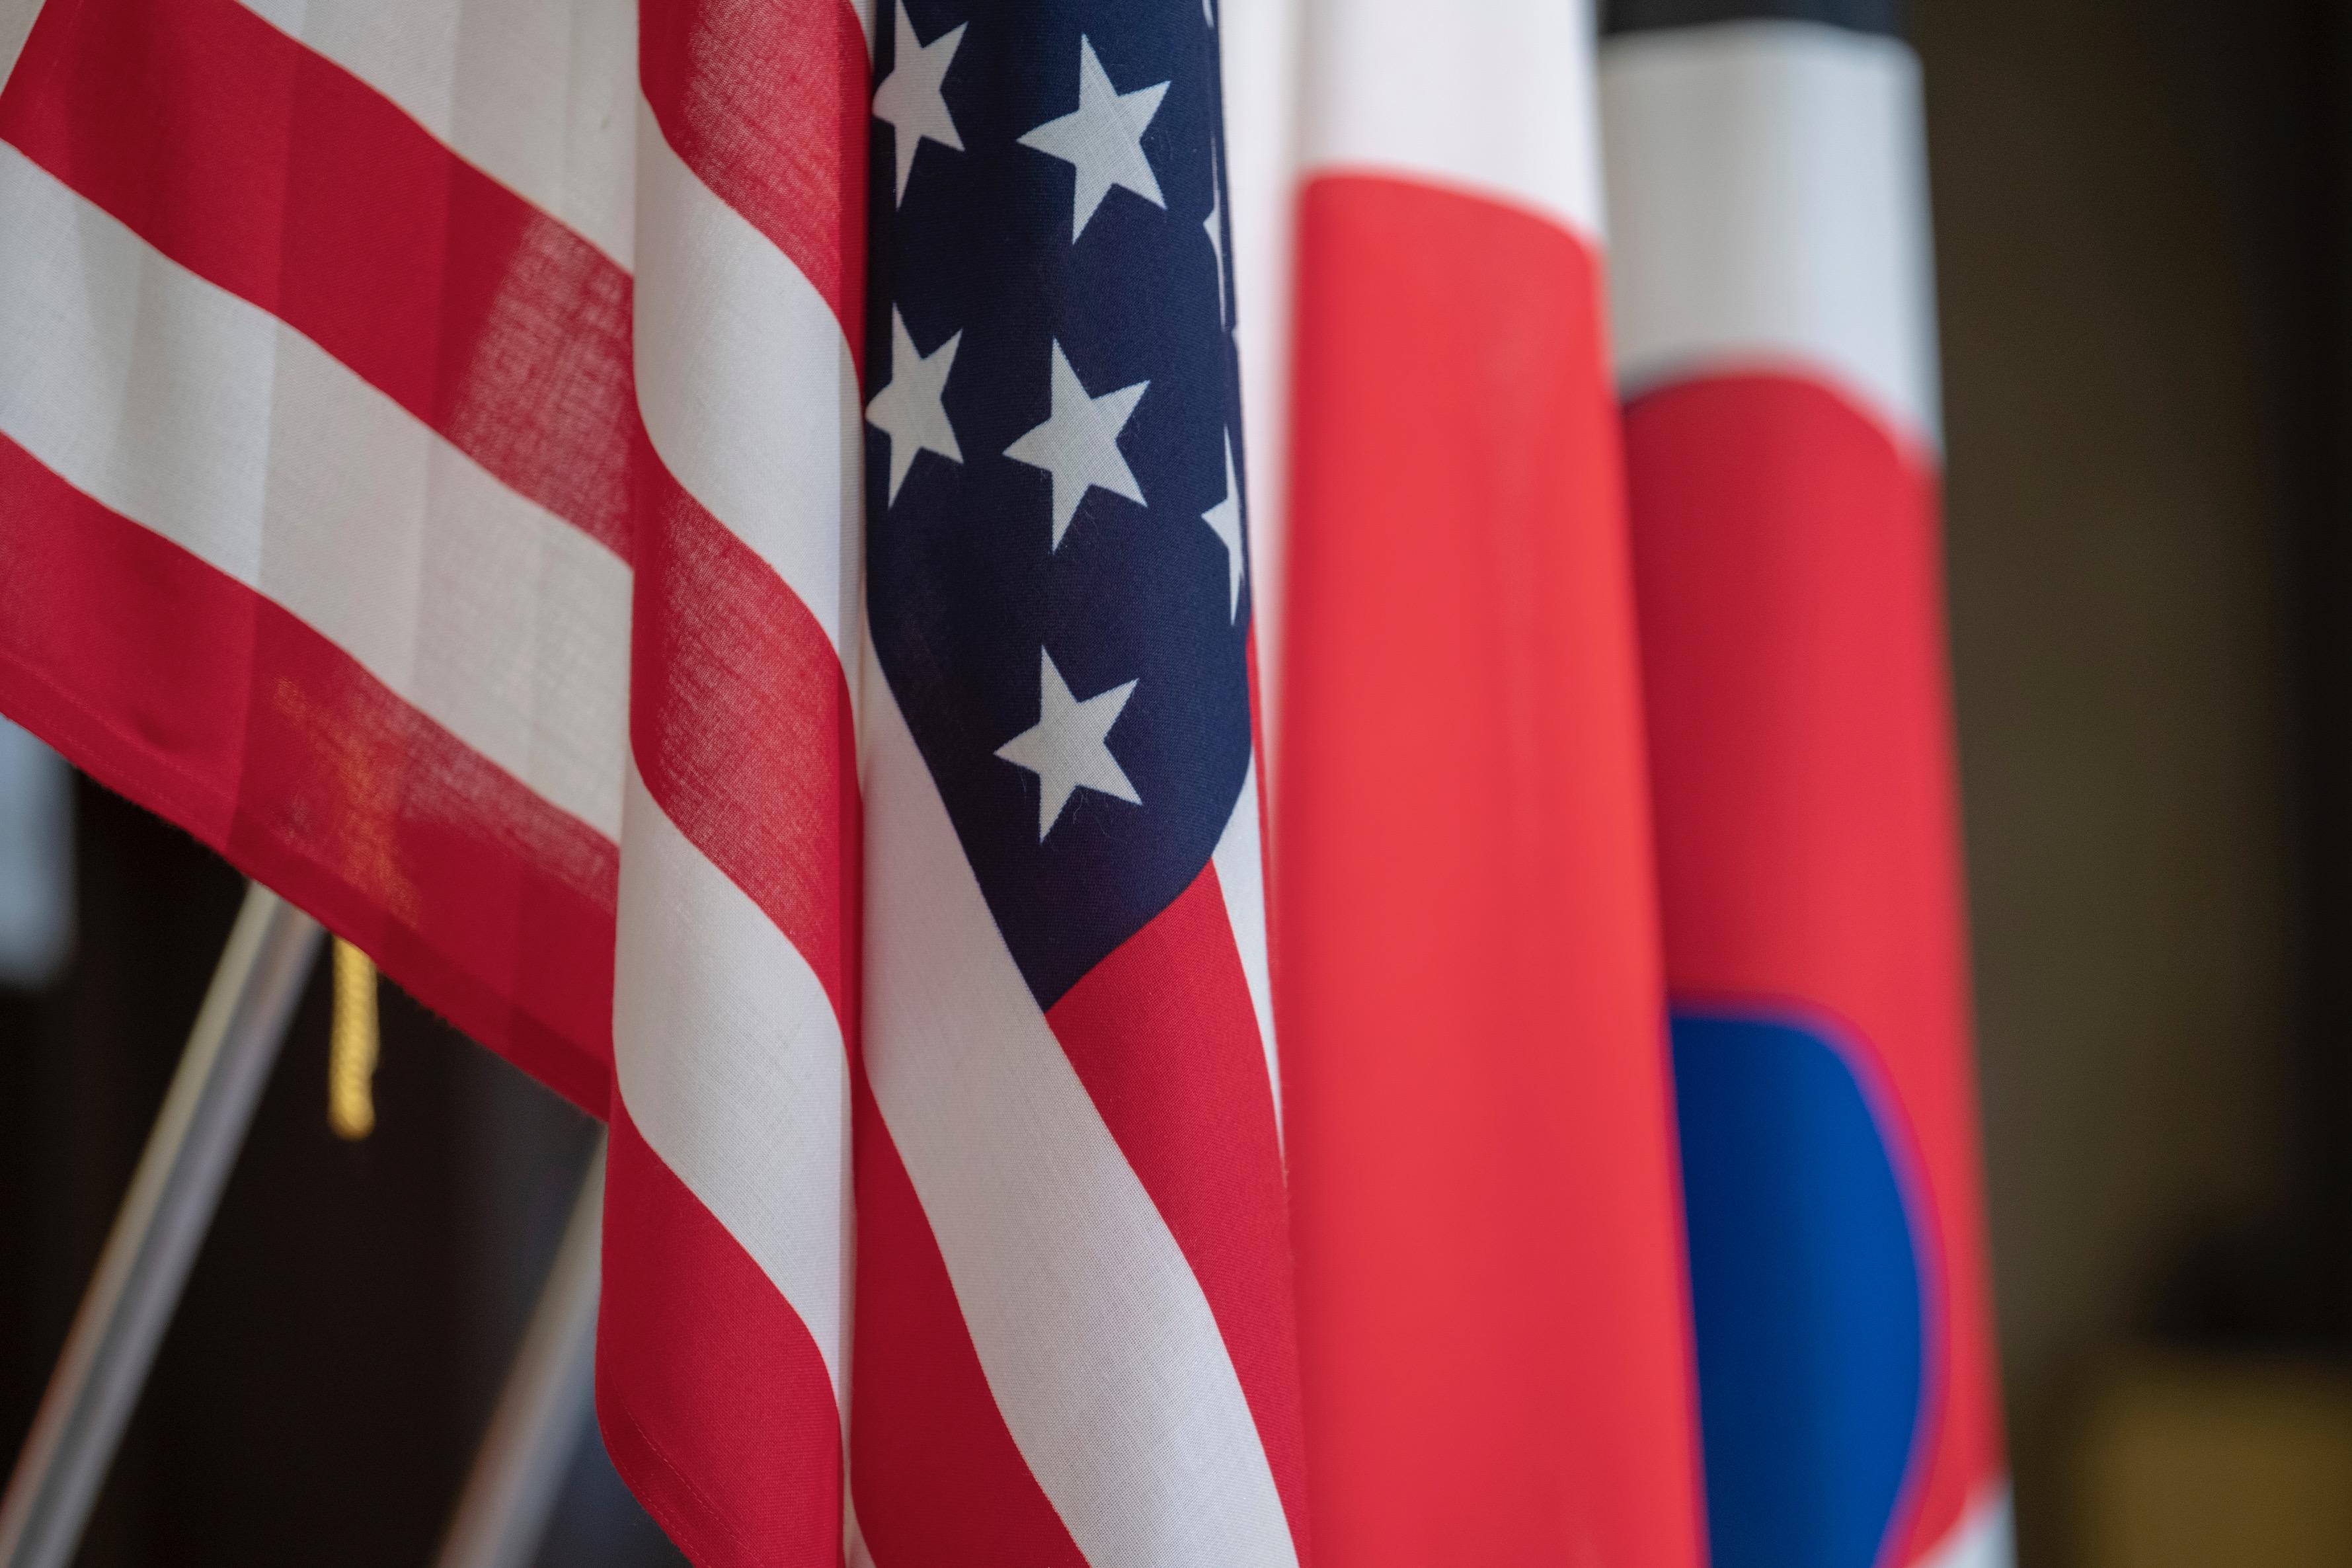 U.S.-Korea NextGen Scholars Program